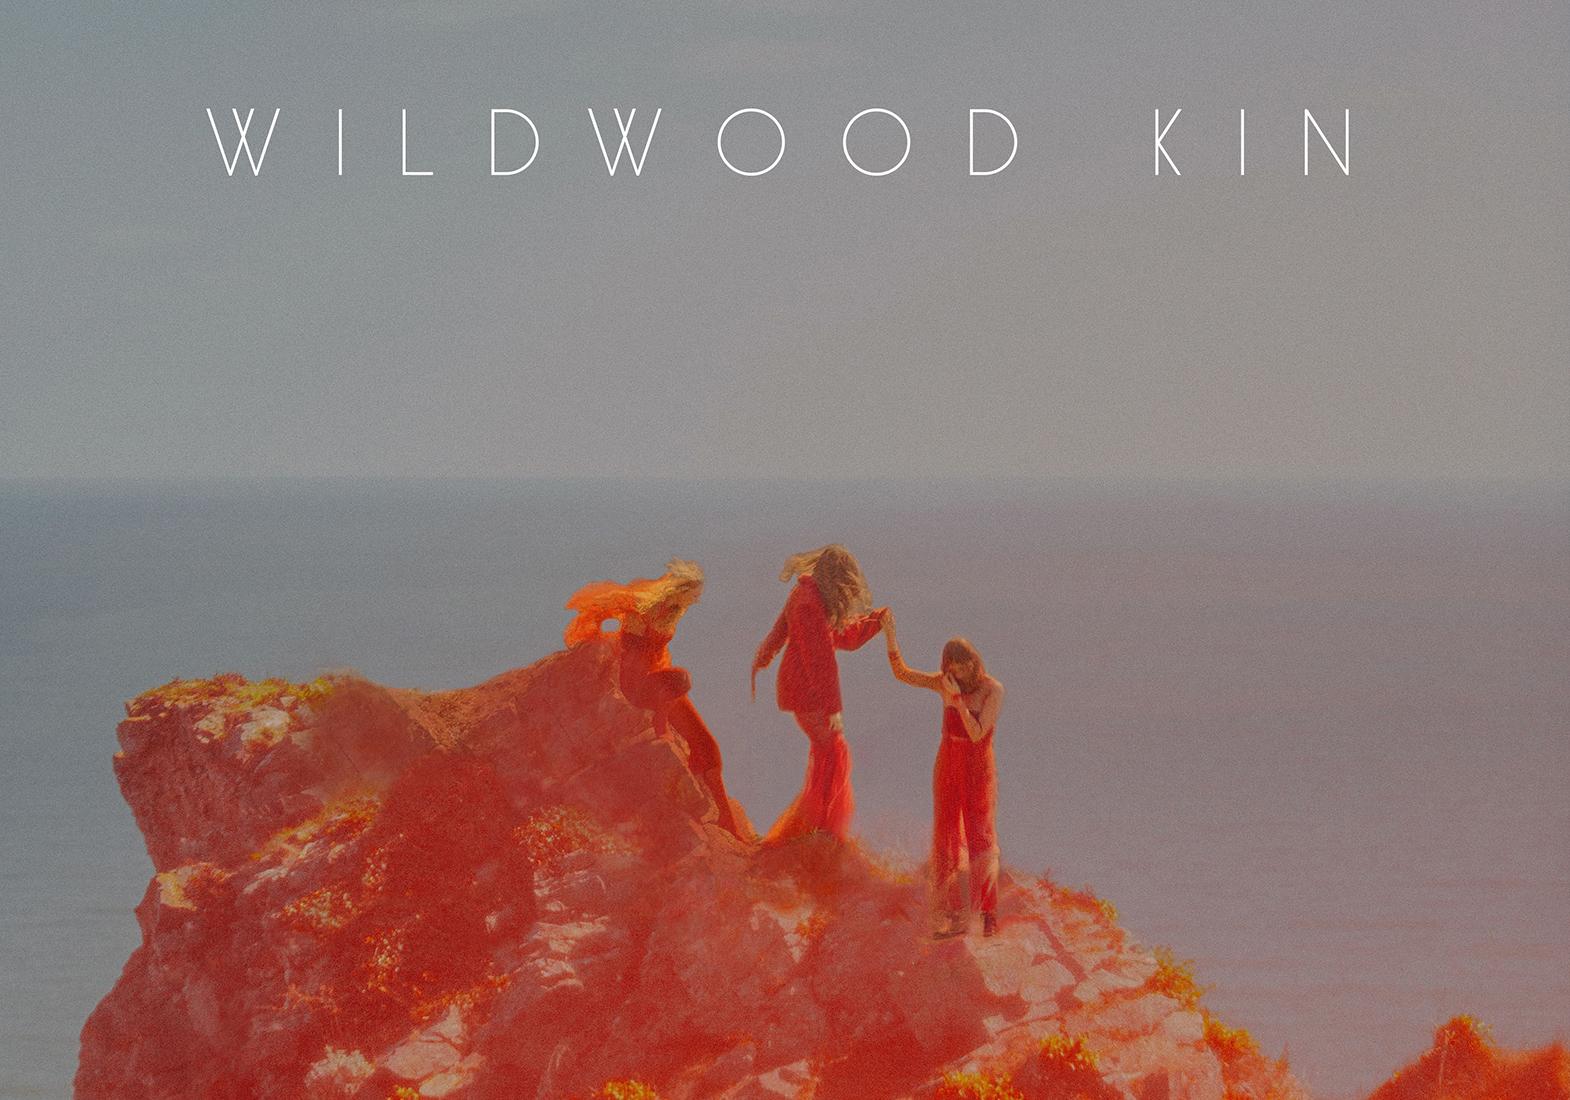 Wildwood Kin Website News Template Correct Size